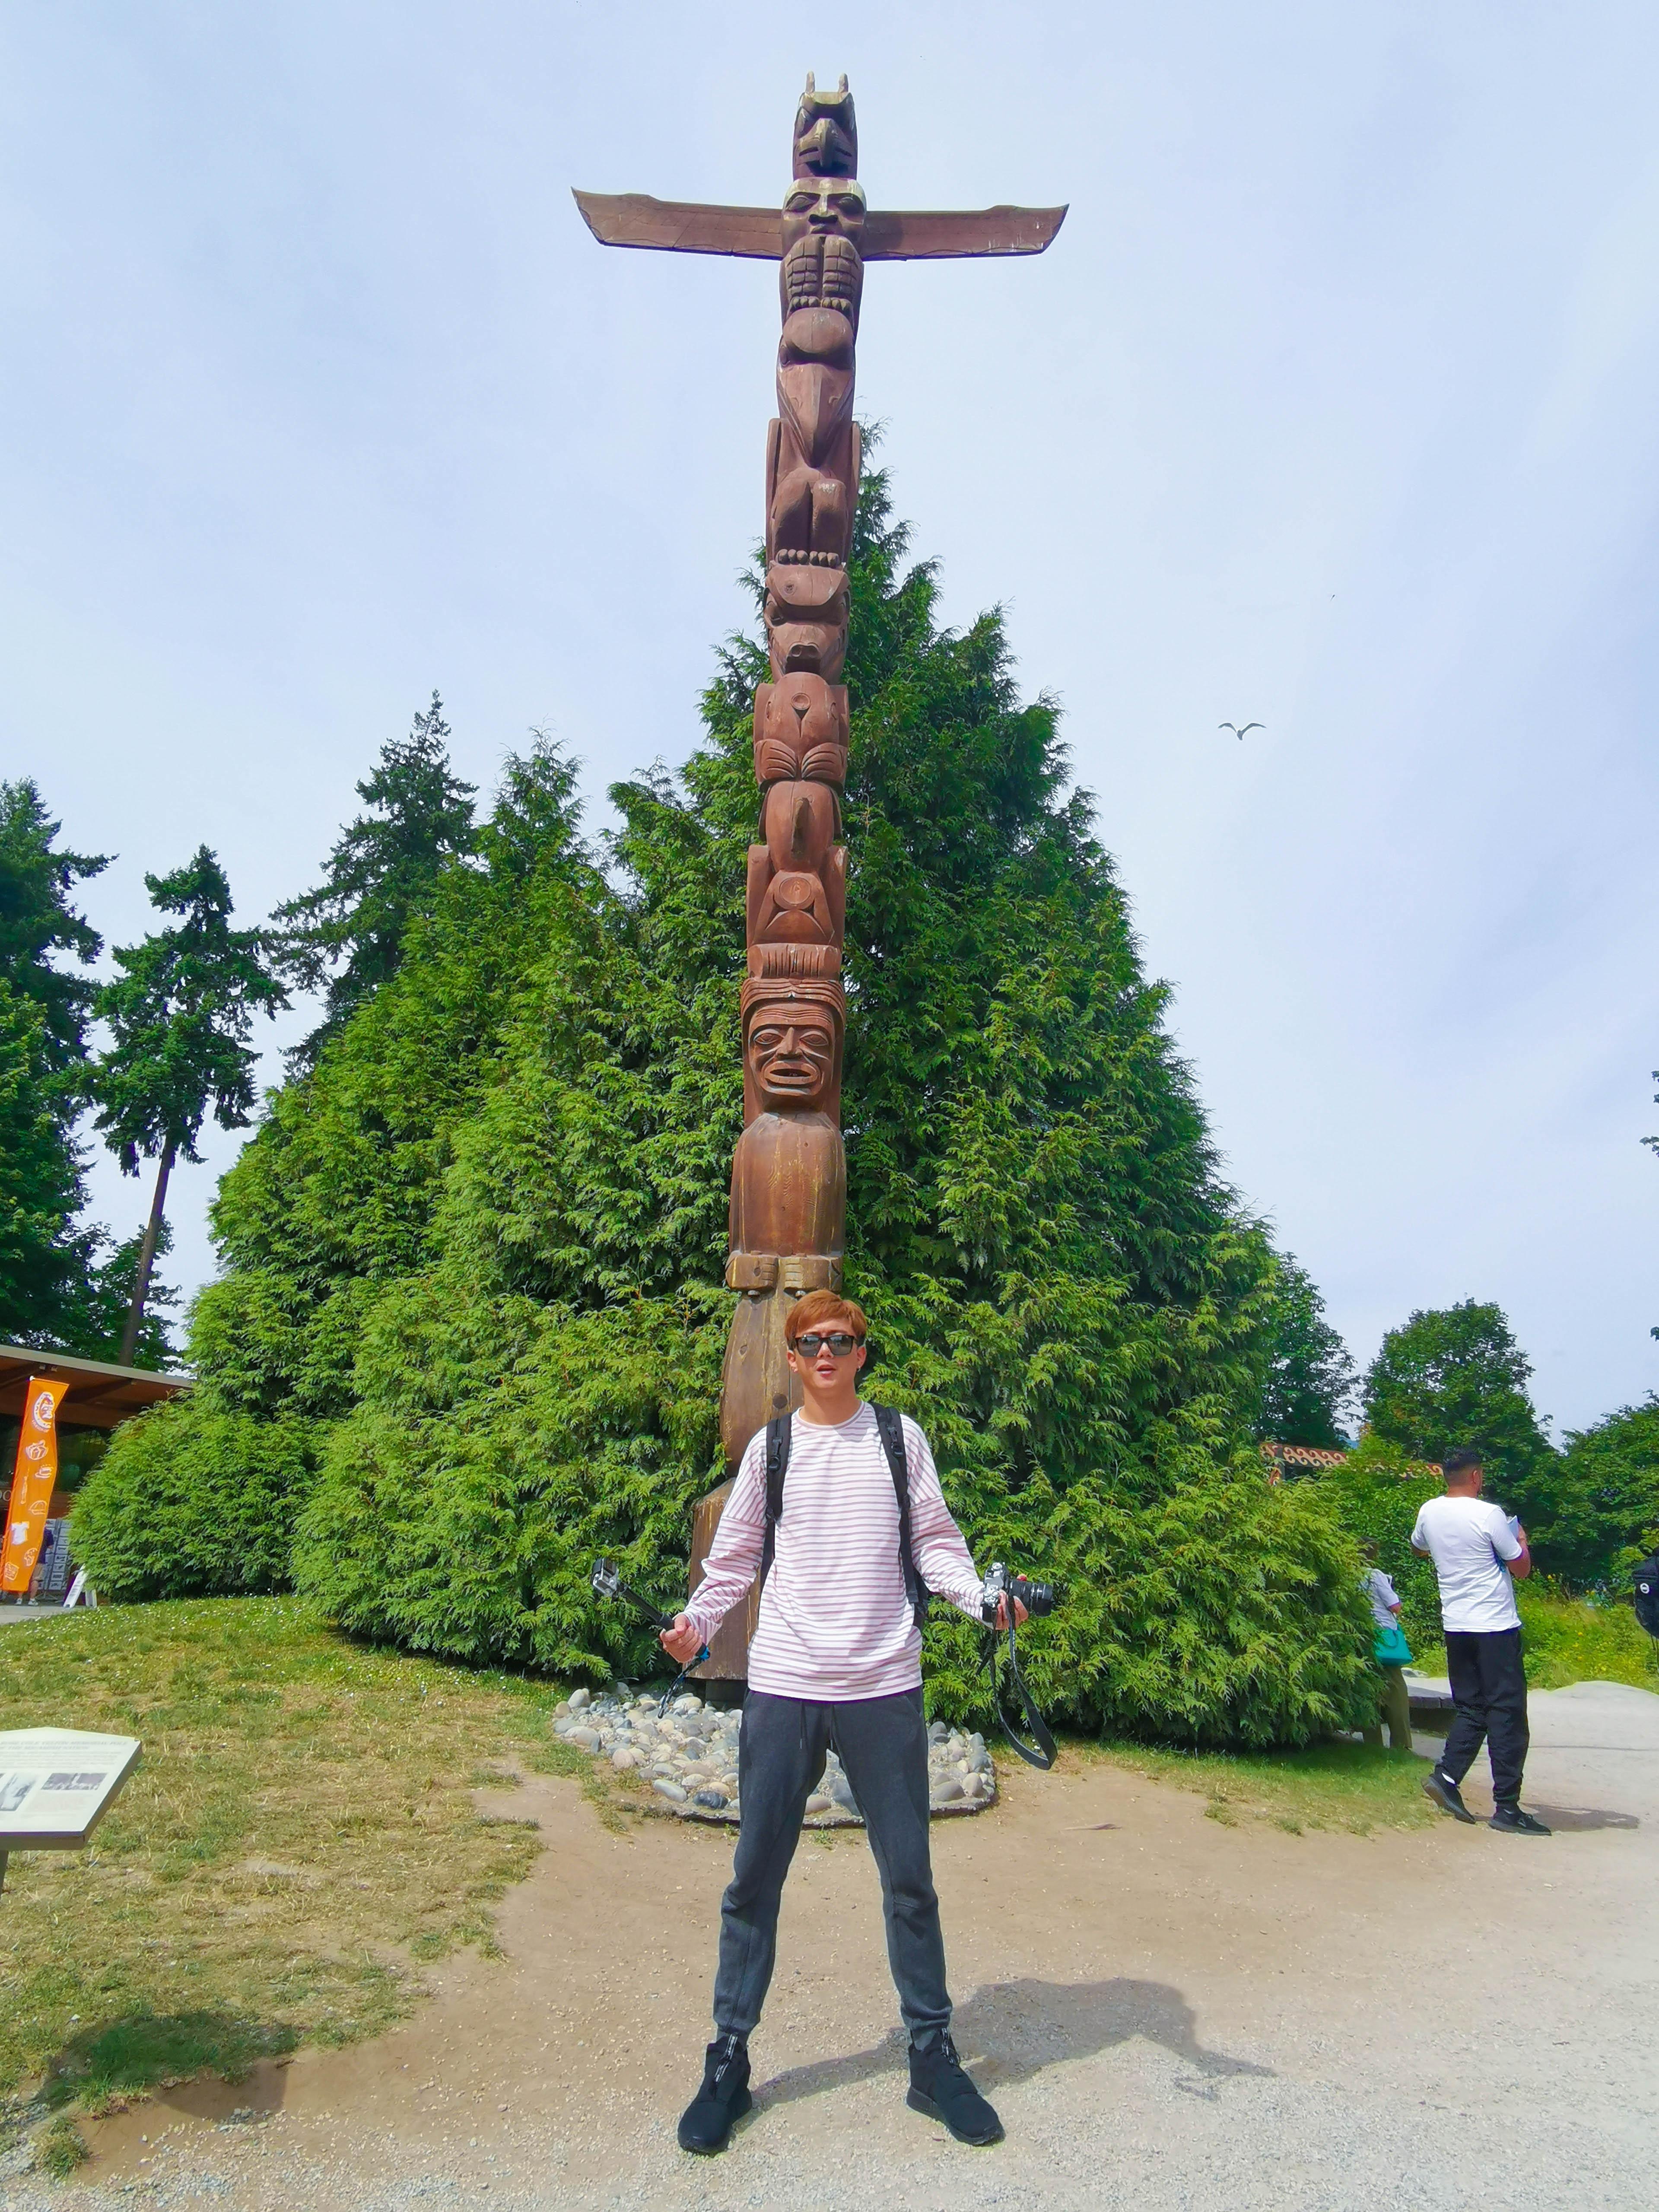 Stanley Park เที่ยวแคนาดา ทัวร์แคนาดา